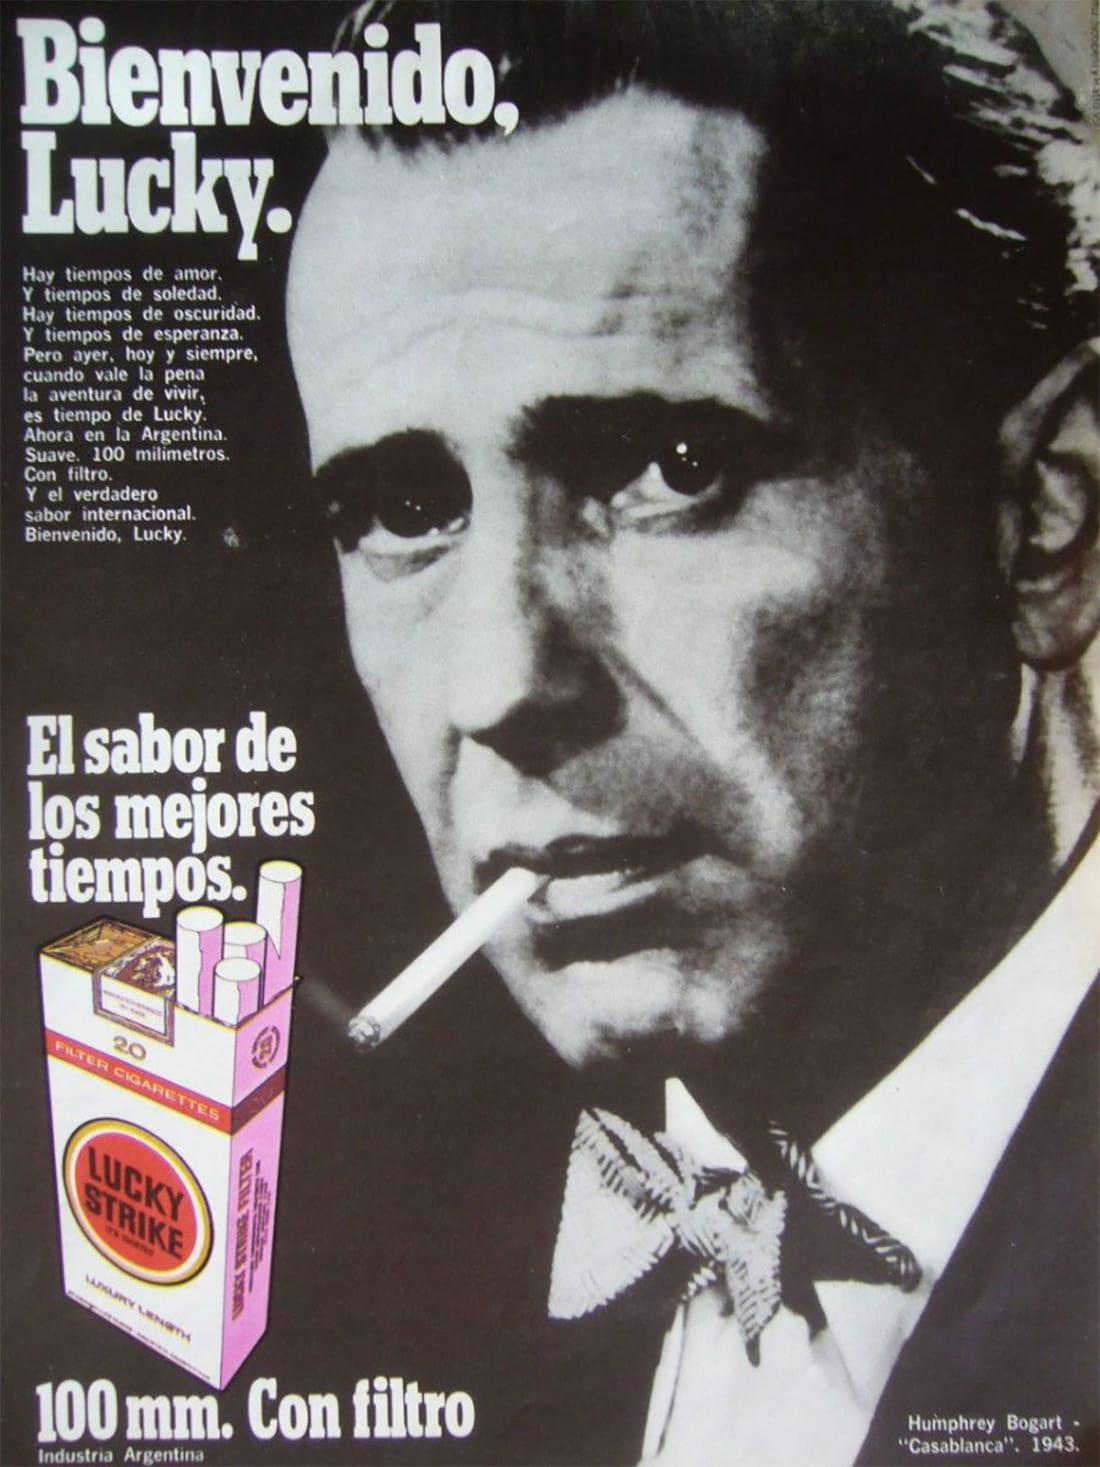 Lucky Strike Cigarette Ad featuring Humphrey Bogart